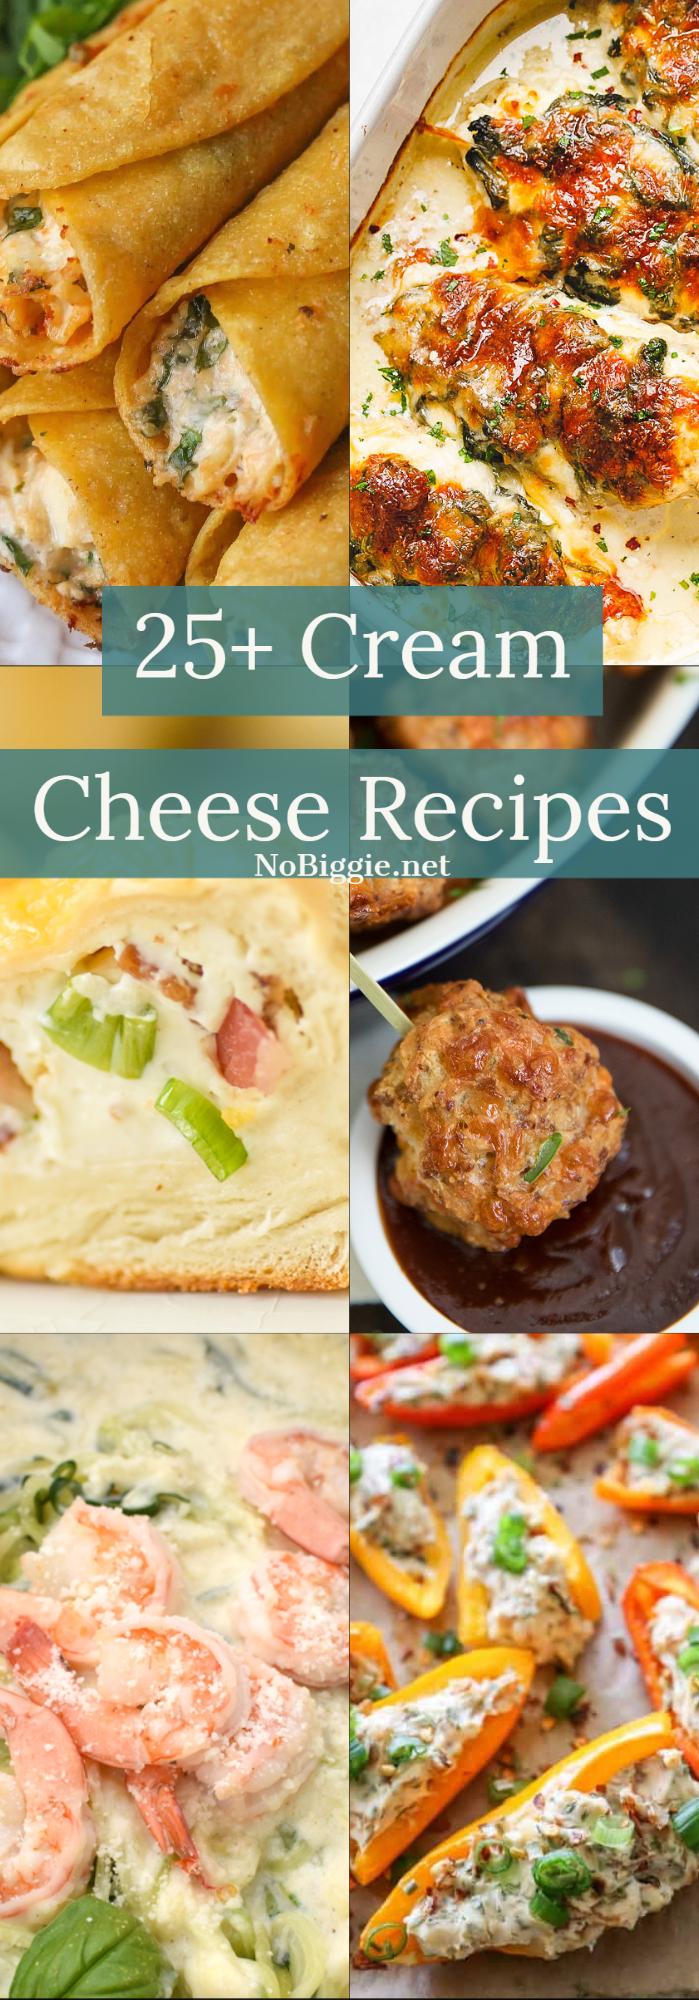 25+ Cream Cheese Recipes | NoBiggie.net